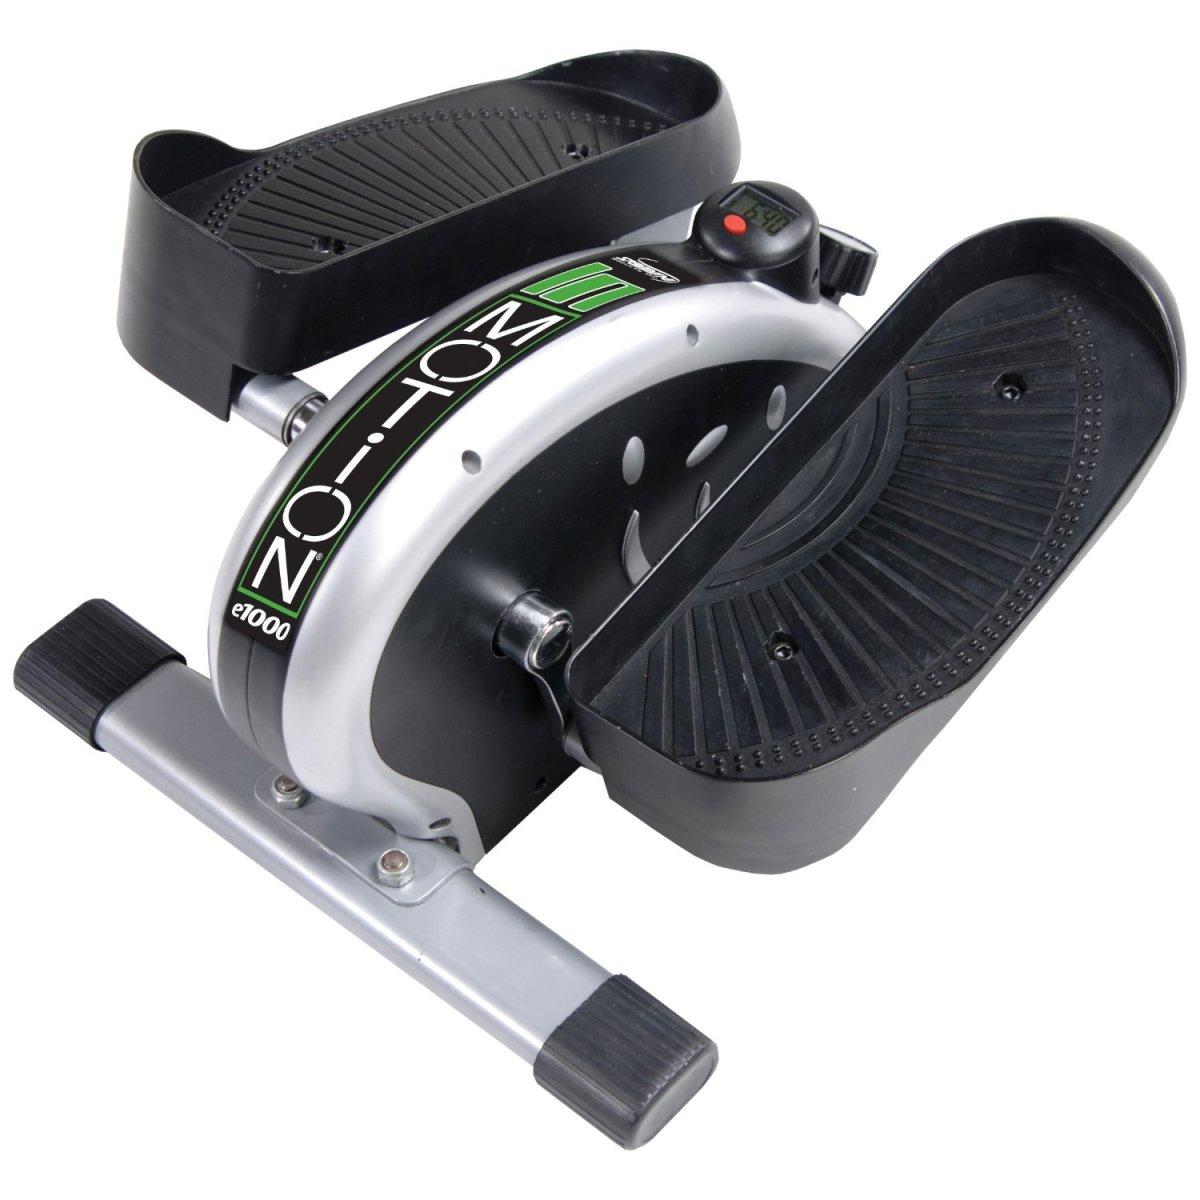 elliptical compact machine